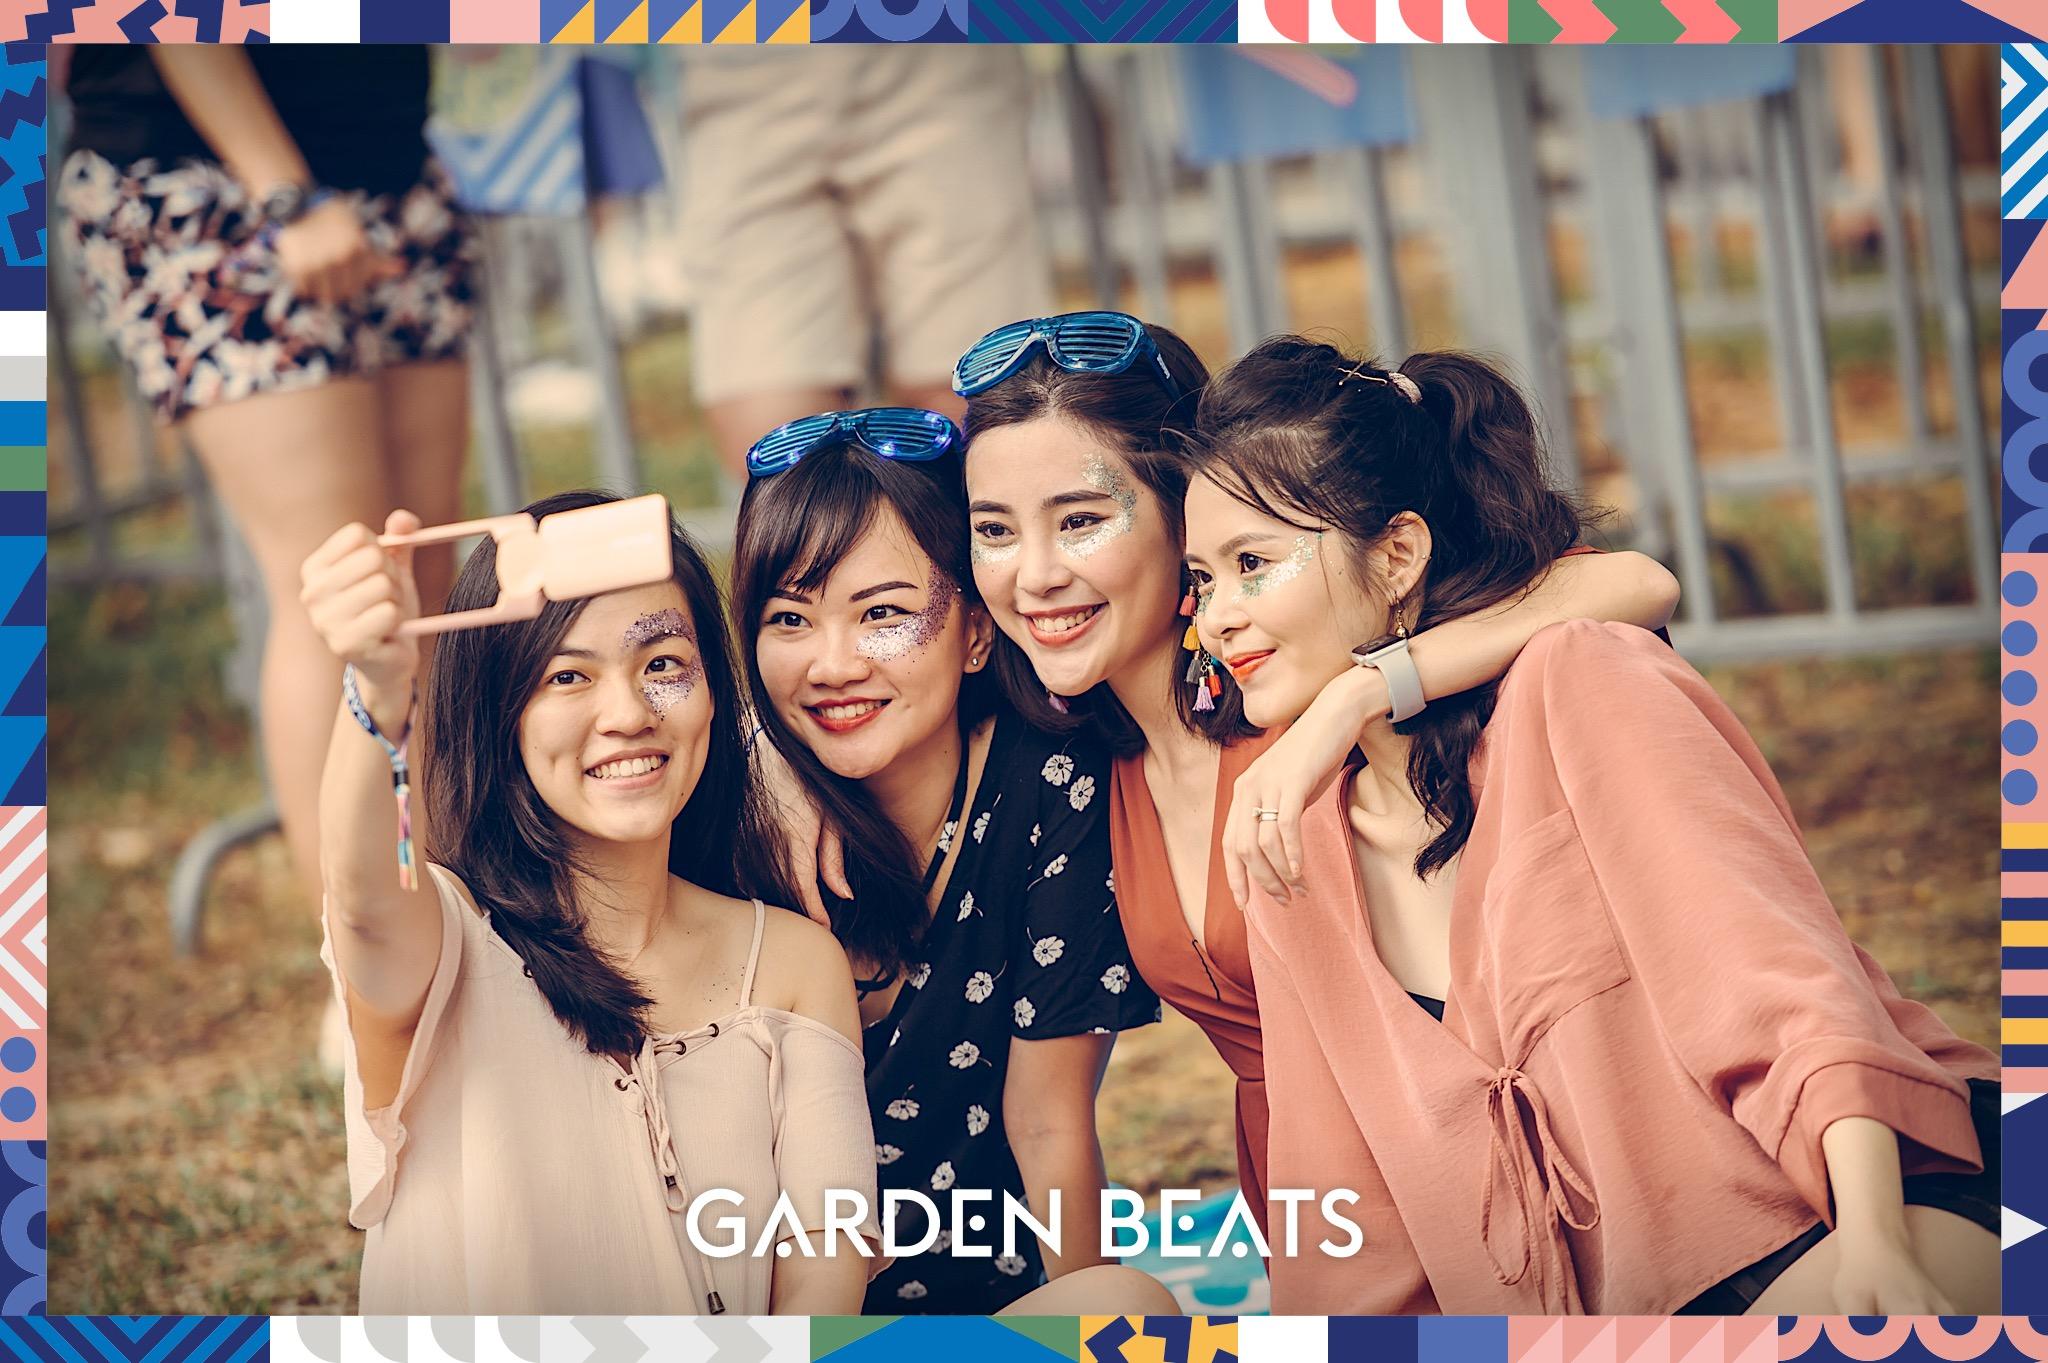 03032018_GardenBeats_Colossal515_Watermarked.jpg